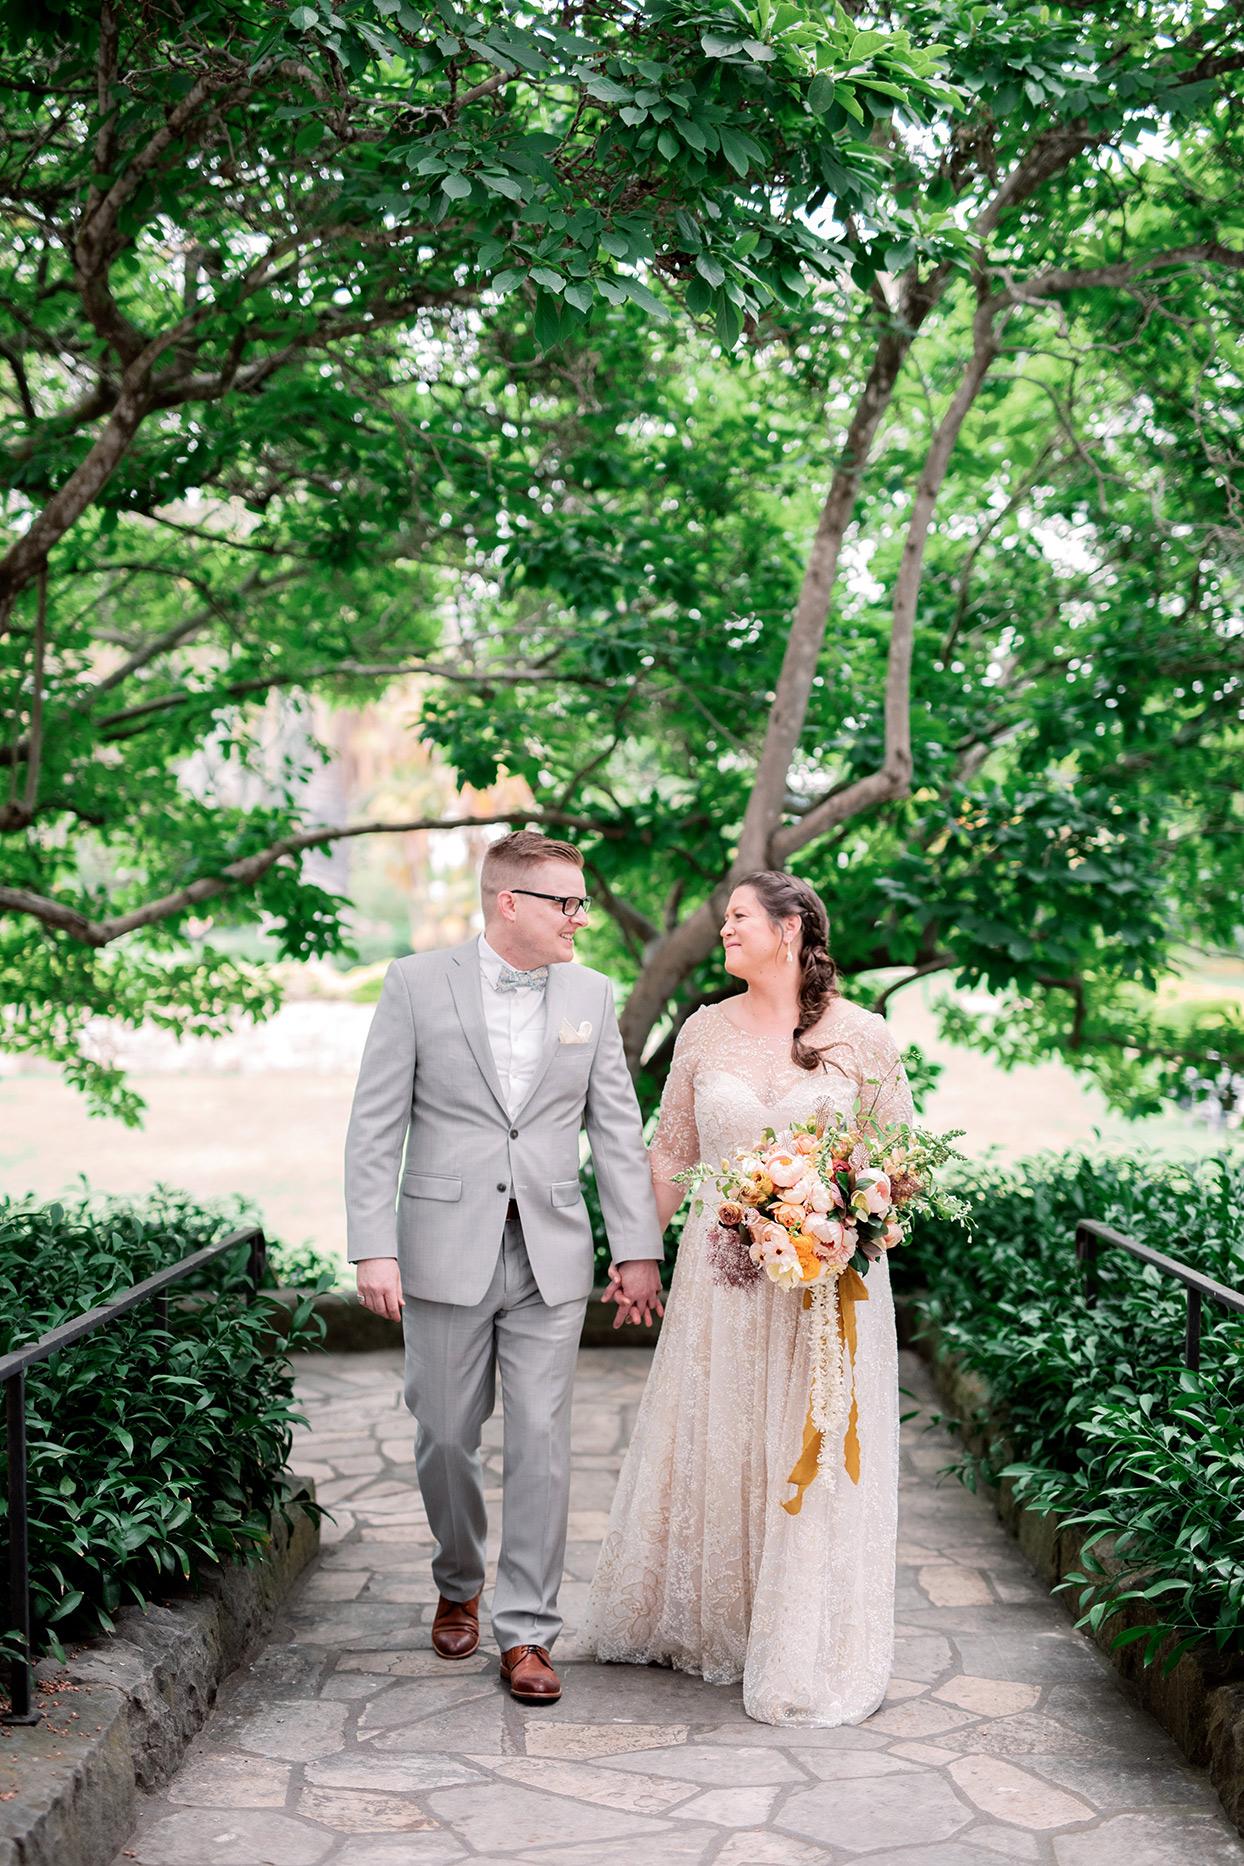 nina devon wedding couple walking on stone path